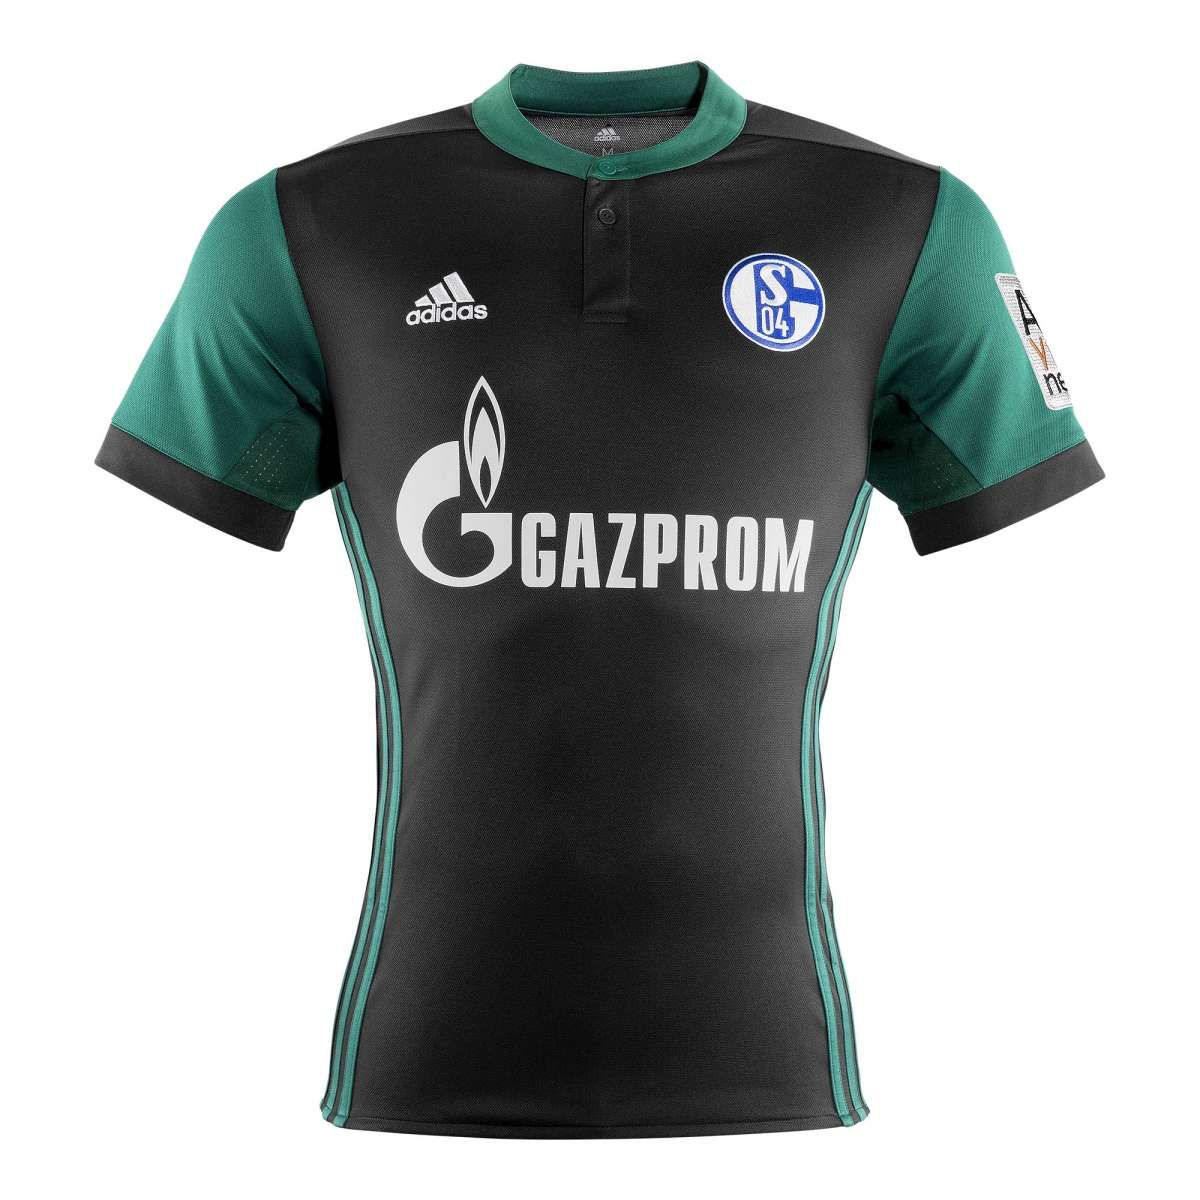 comprar camiseta Bayer 04 Leverkusen chica